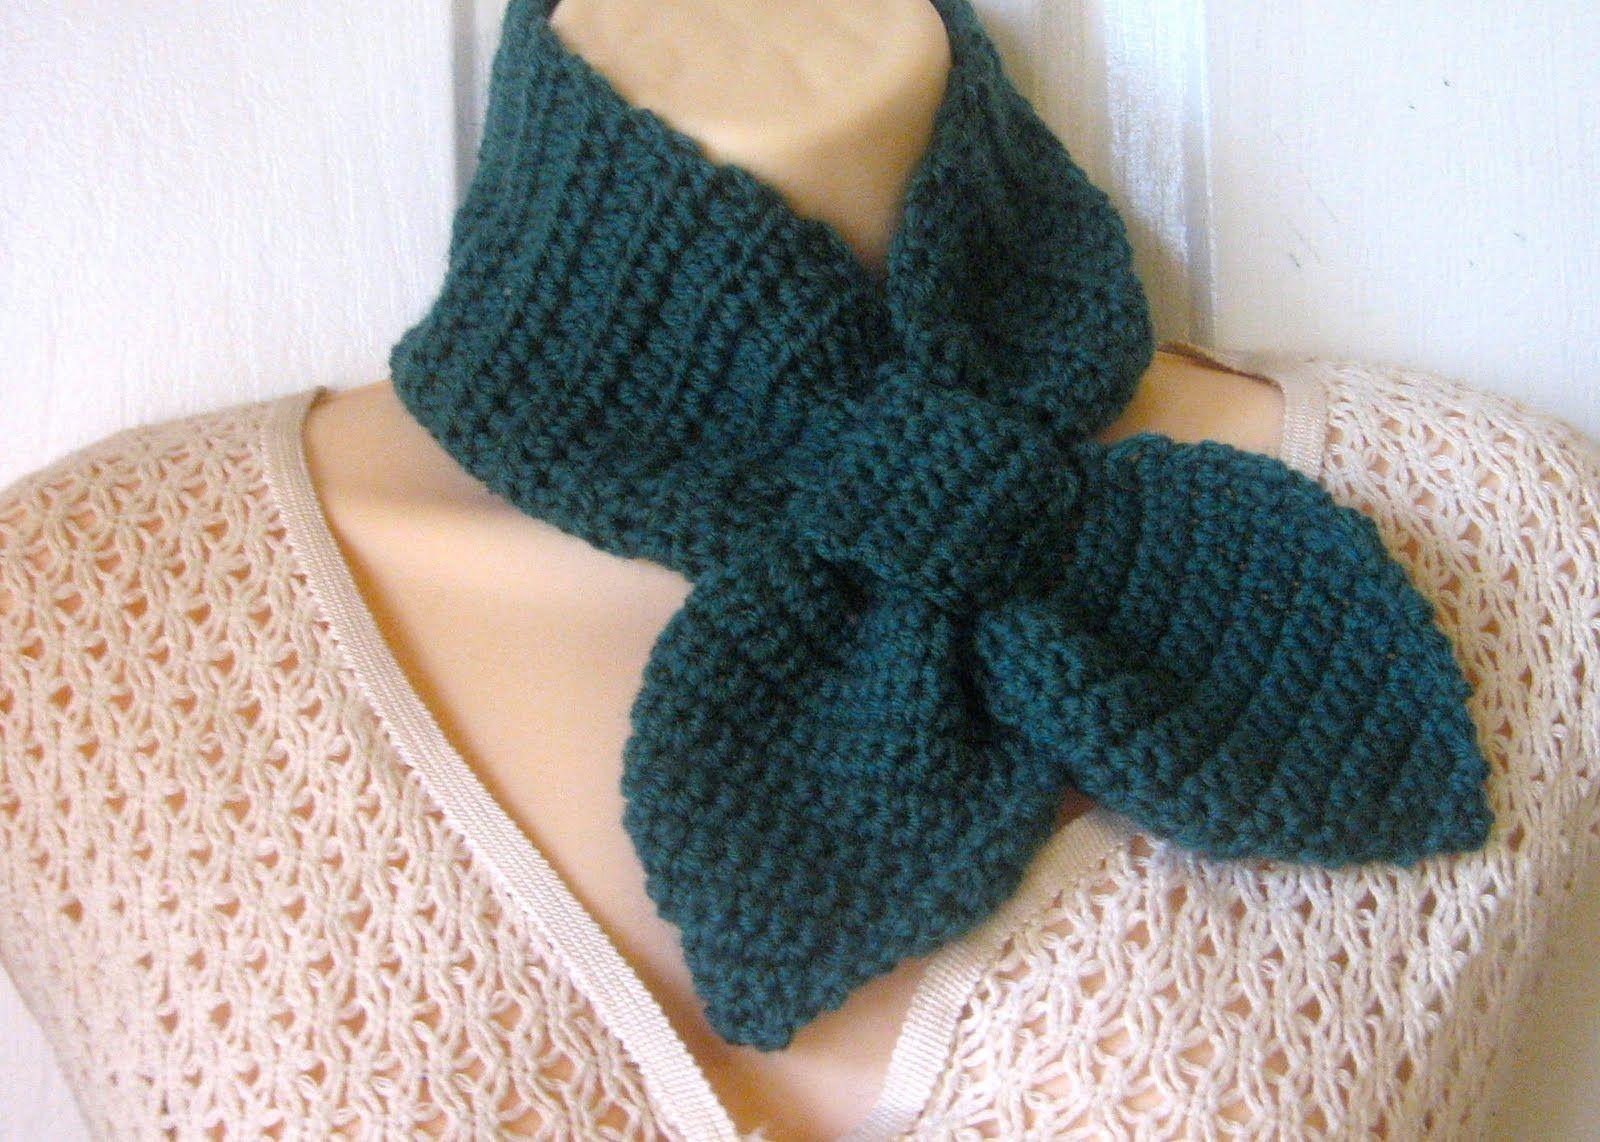 Crochet A Neck Scarf